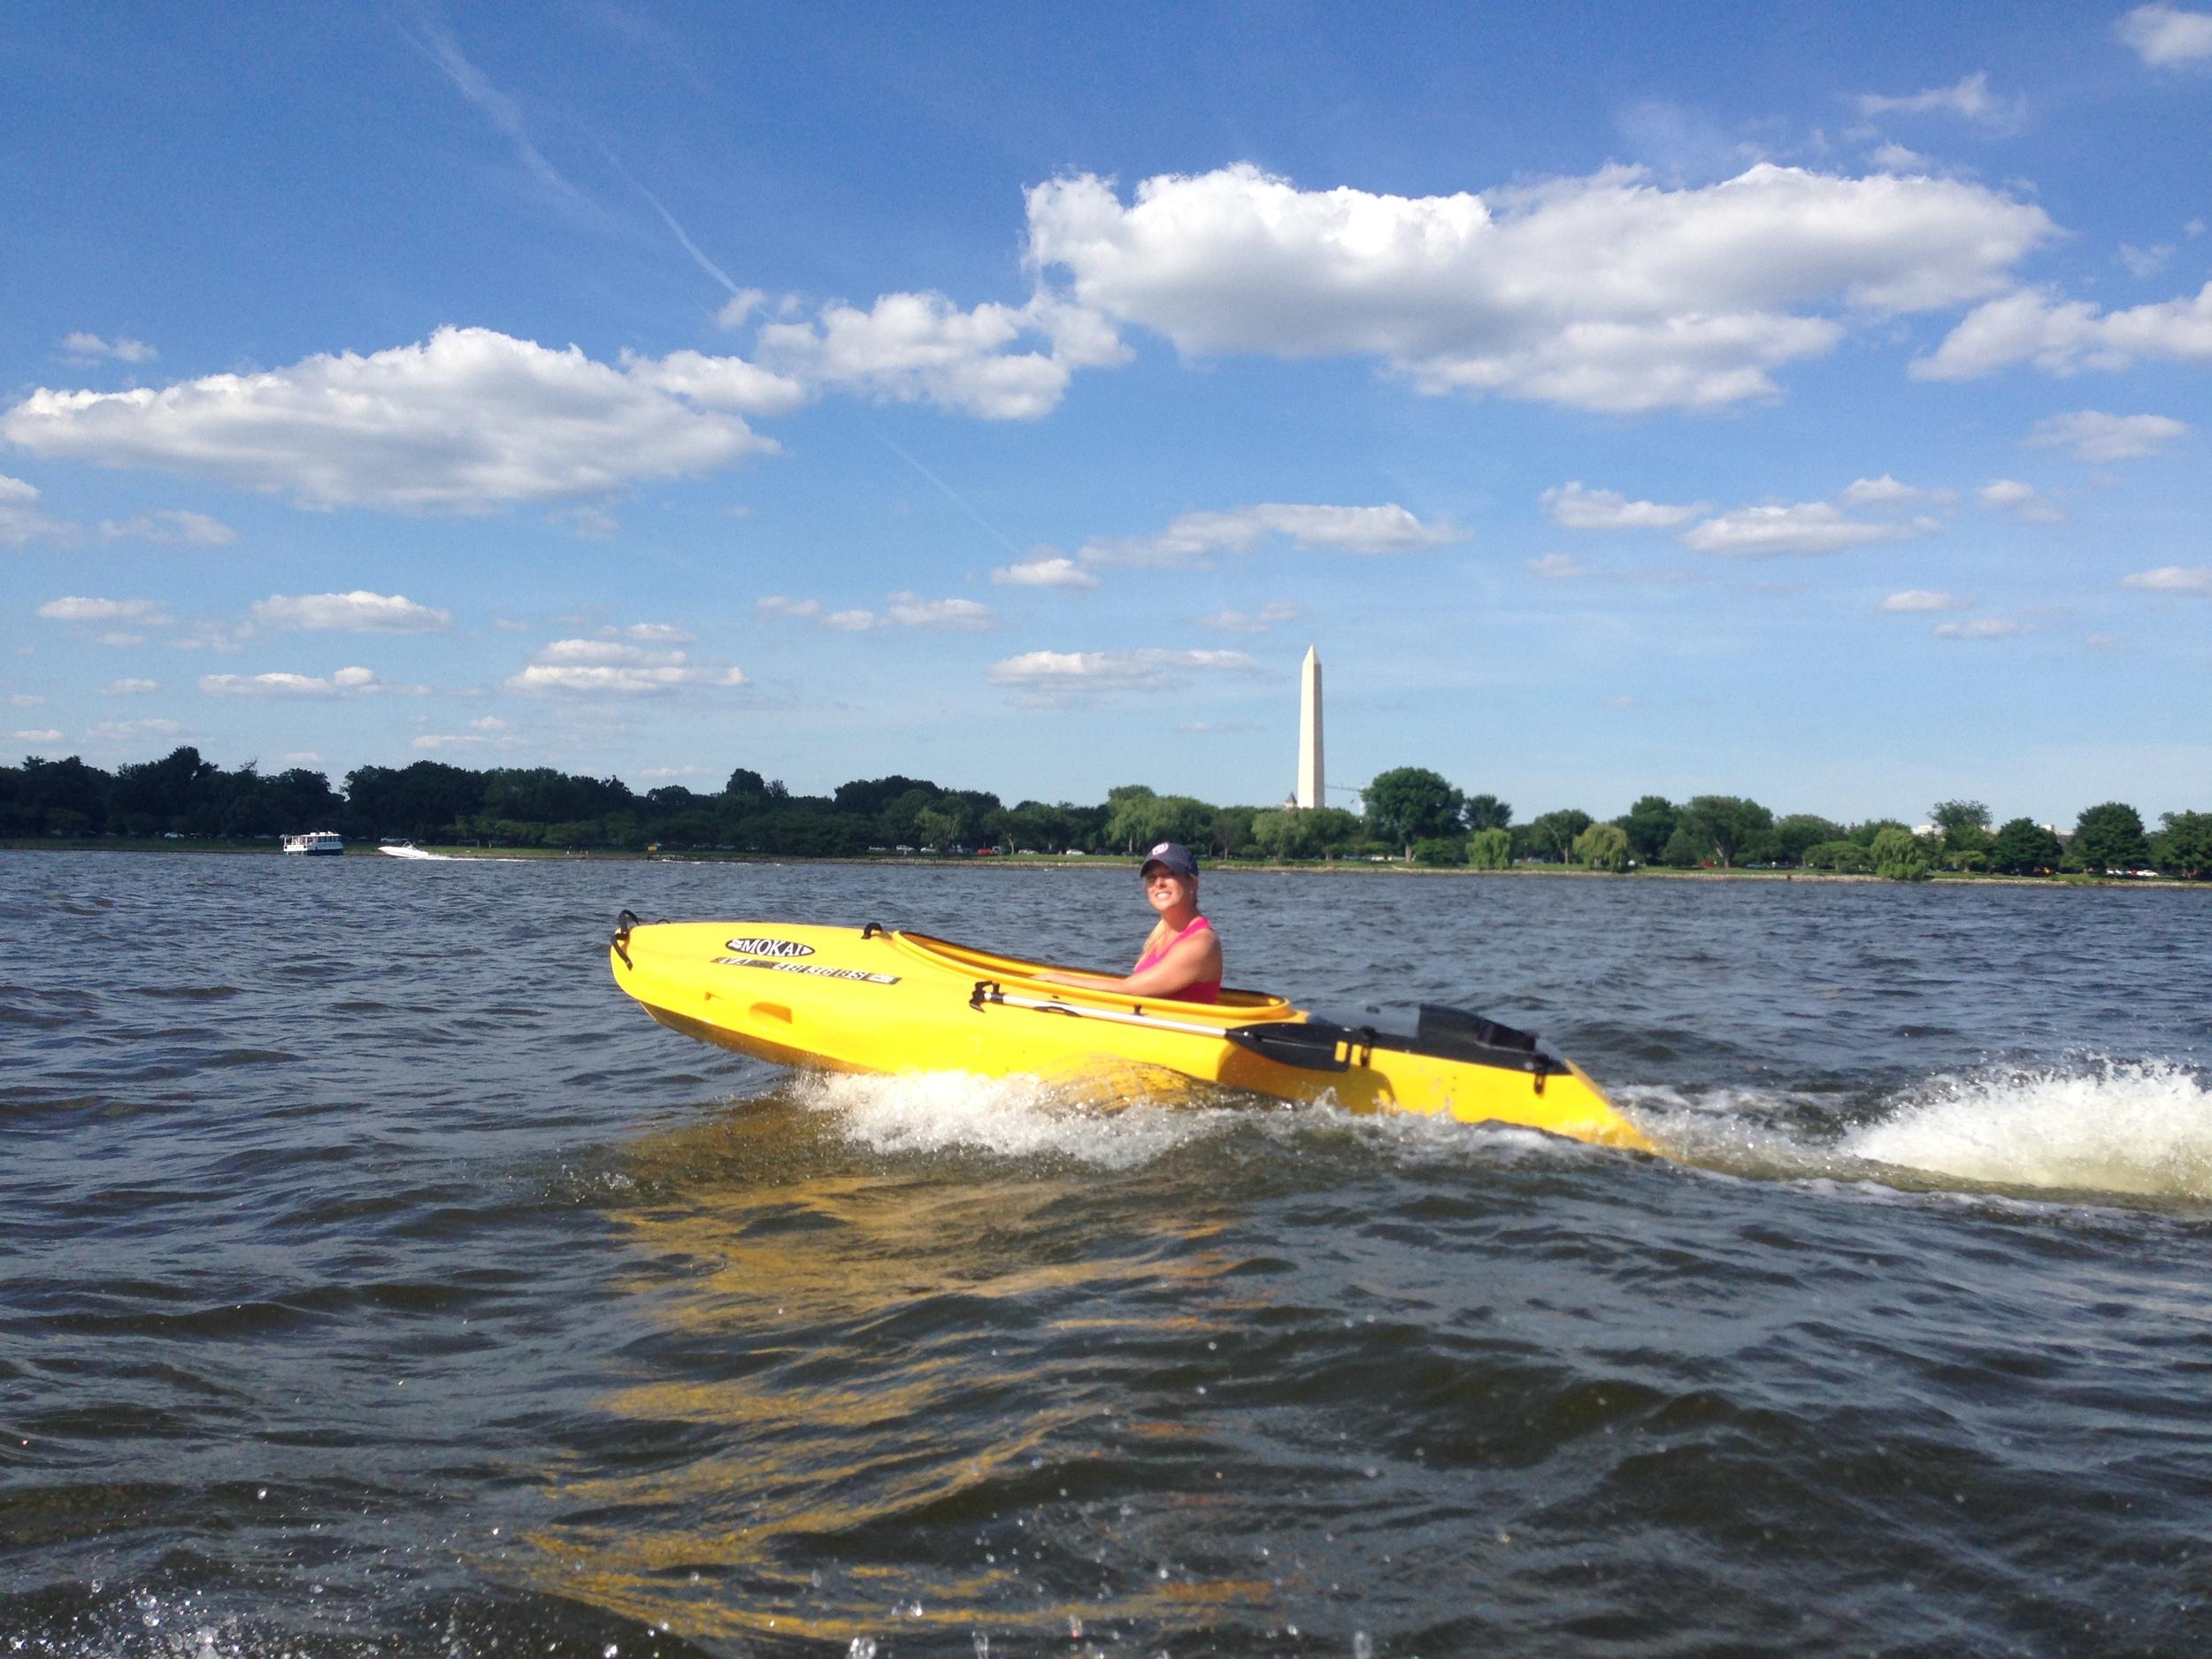 Enjoying the Potomac River